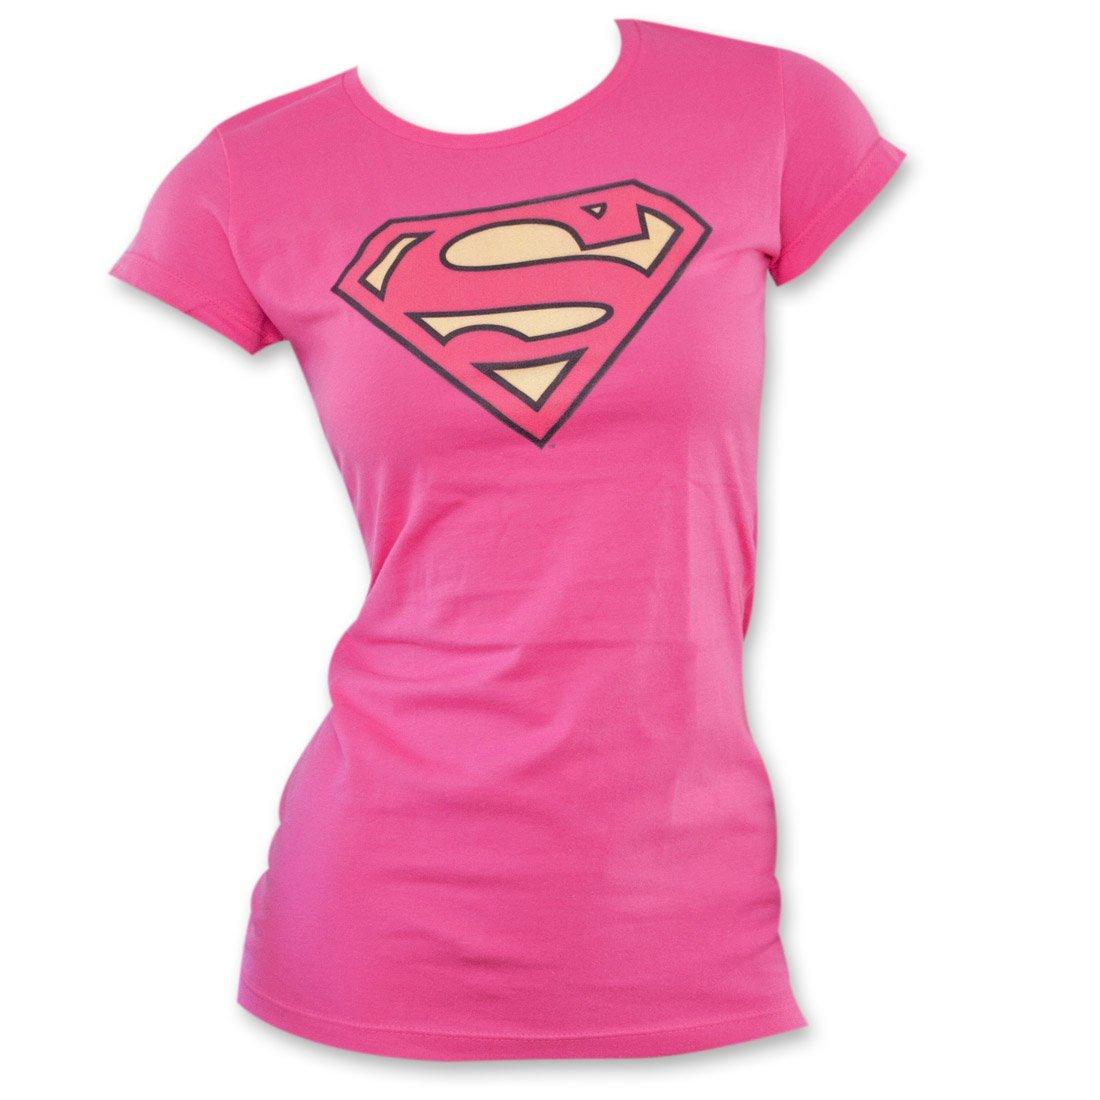 Juniors: DC-Pinky Shield Juniors (Slim) T-Shirt Size M